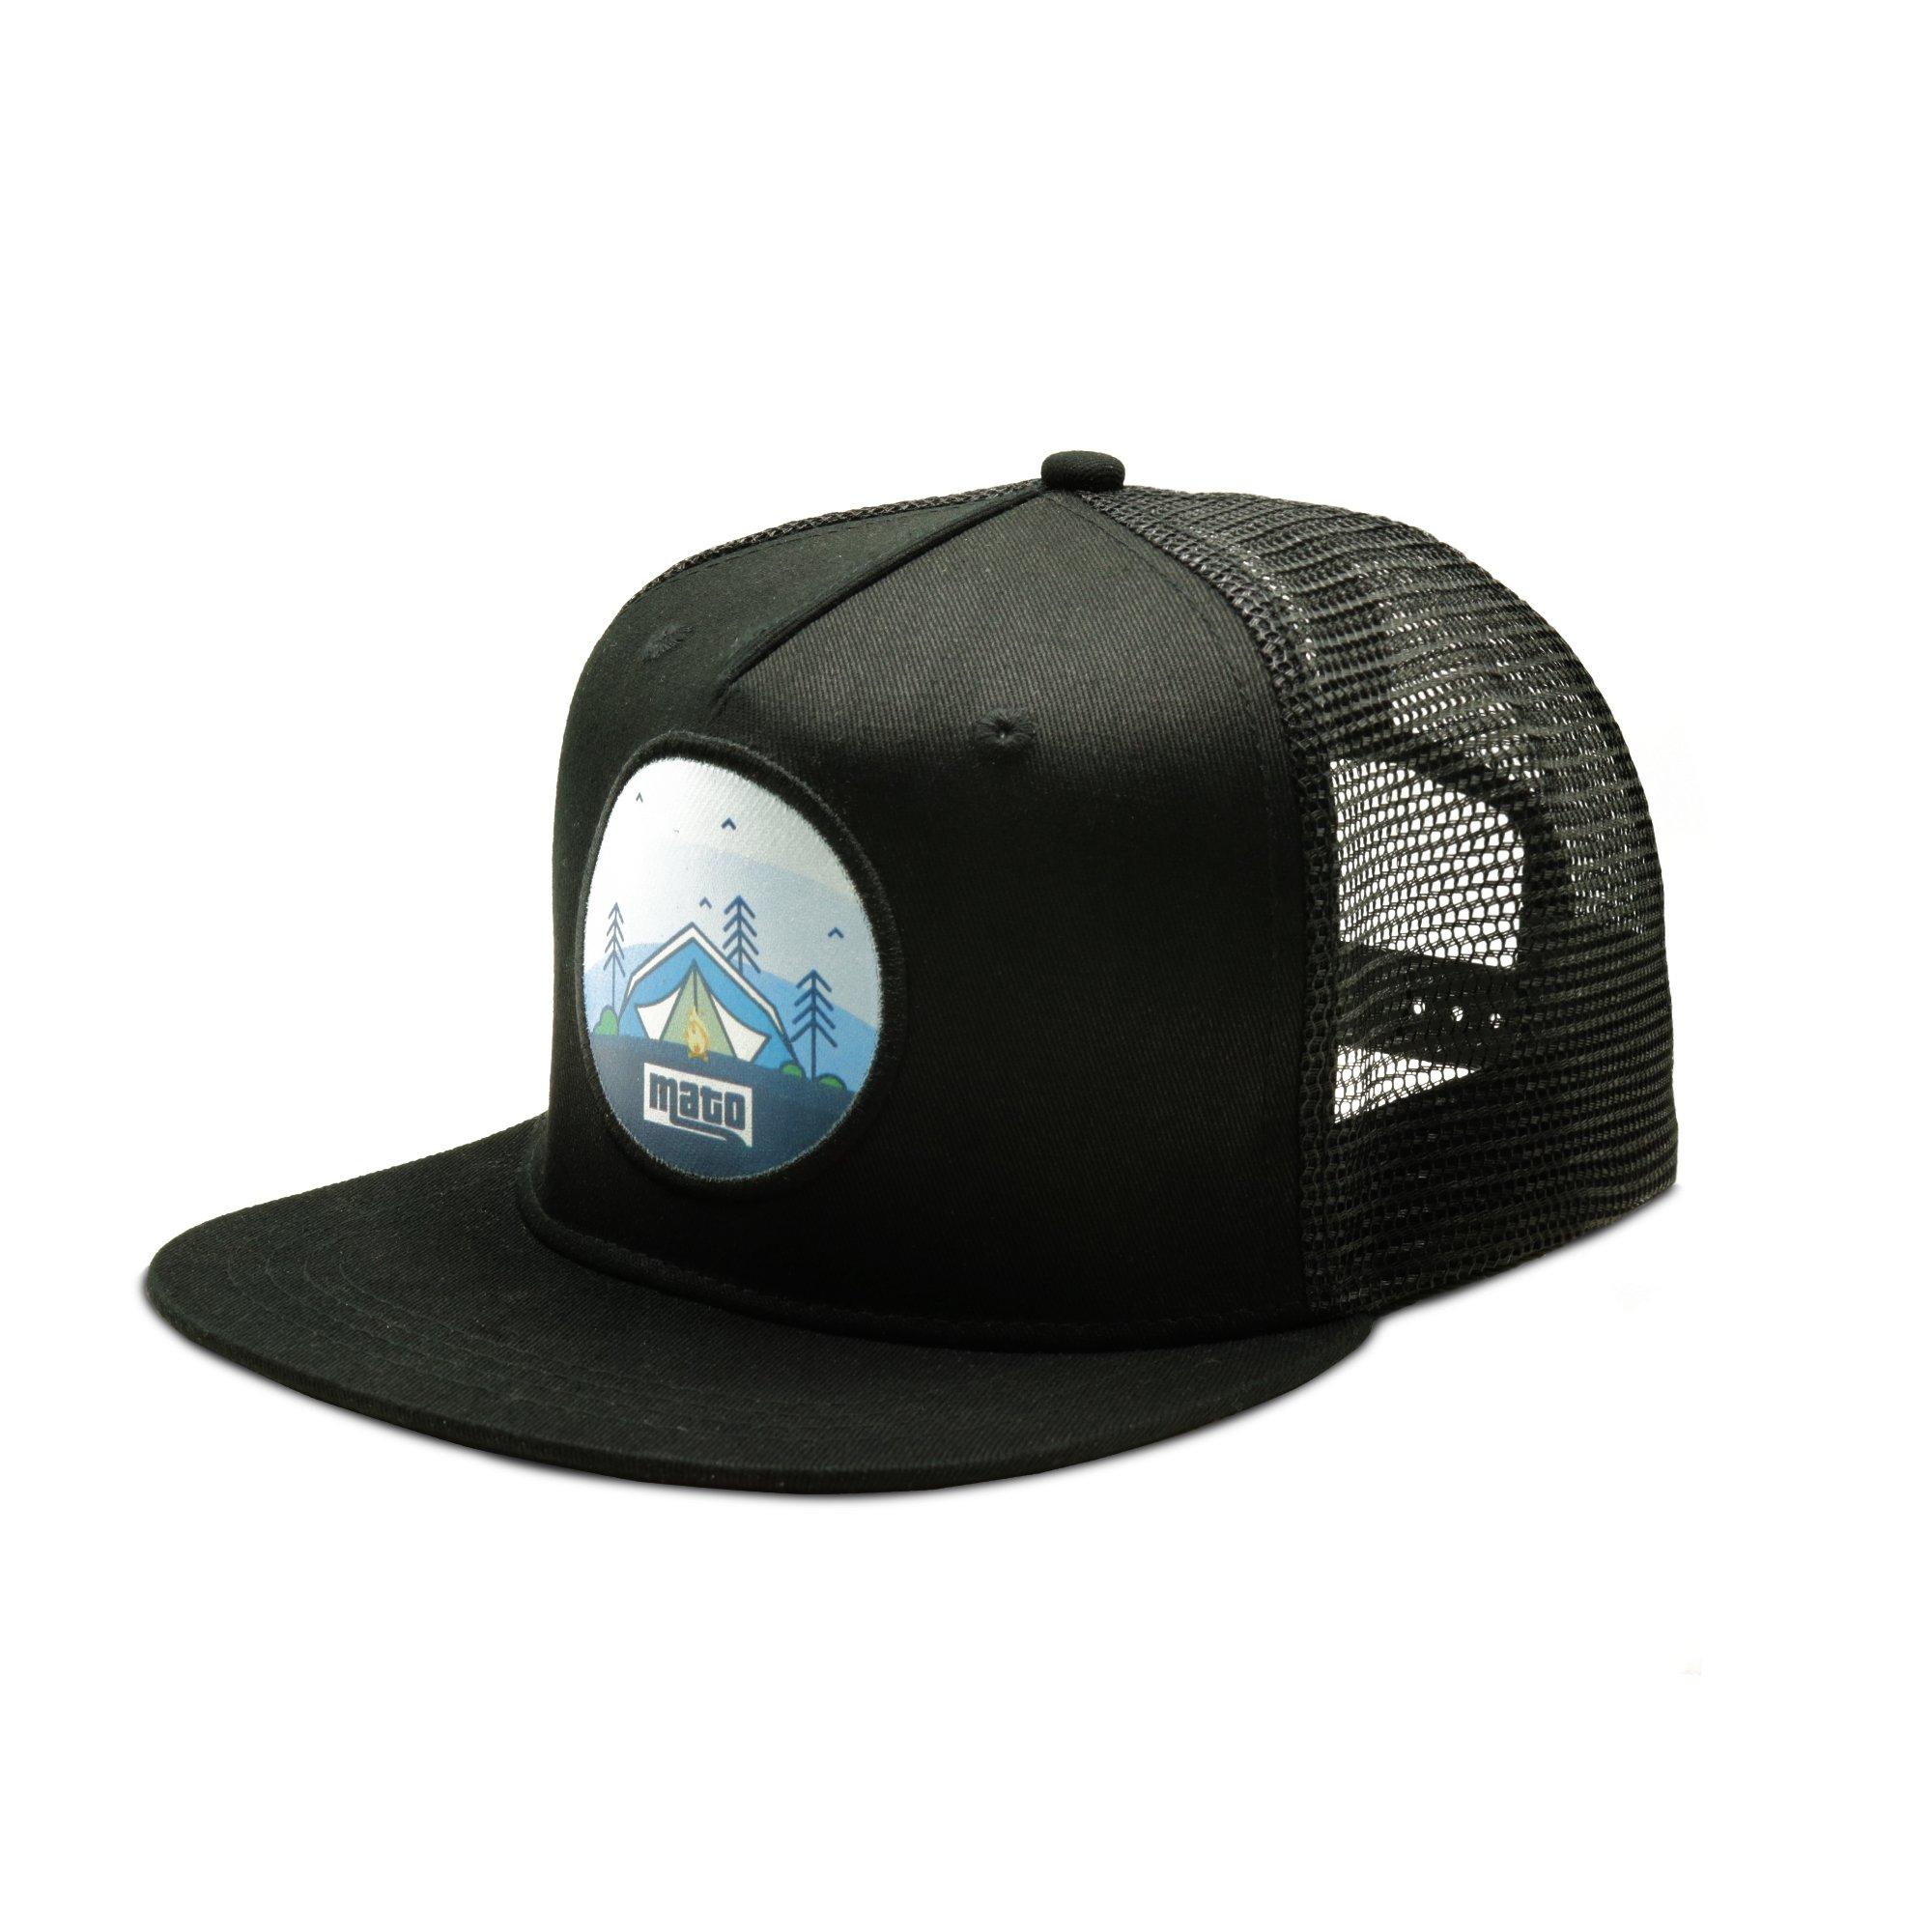 Mato Trucker Hat Snapback Happy Camper Flat Brim Mesh Baseball Cap Black